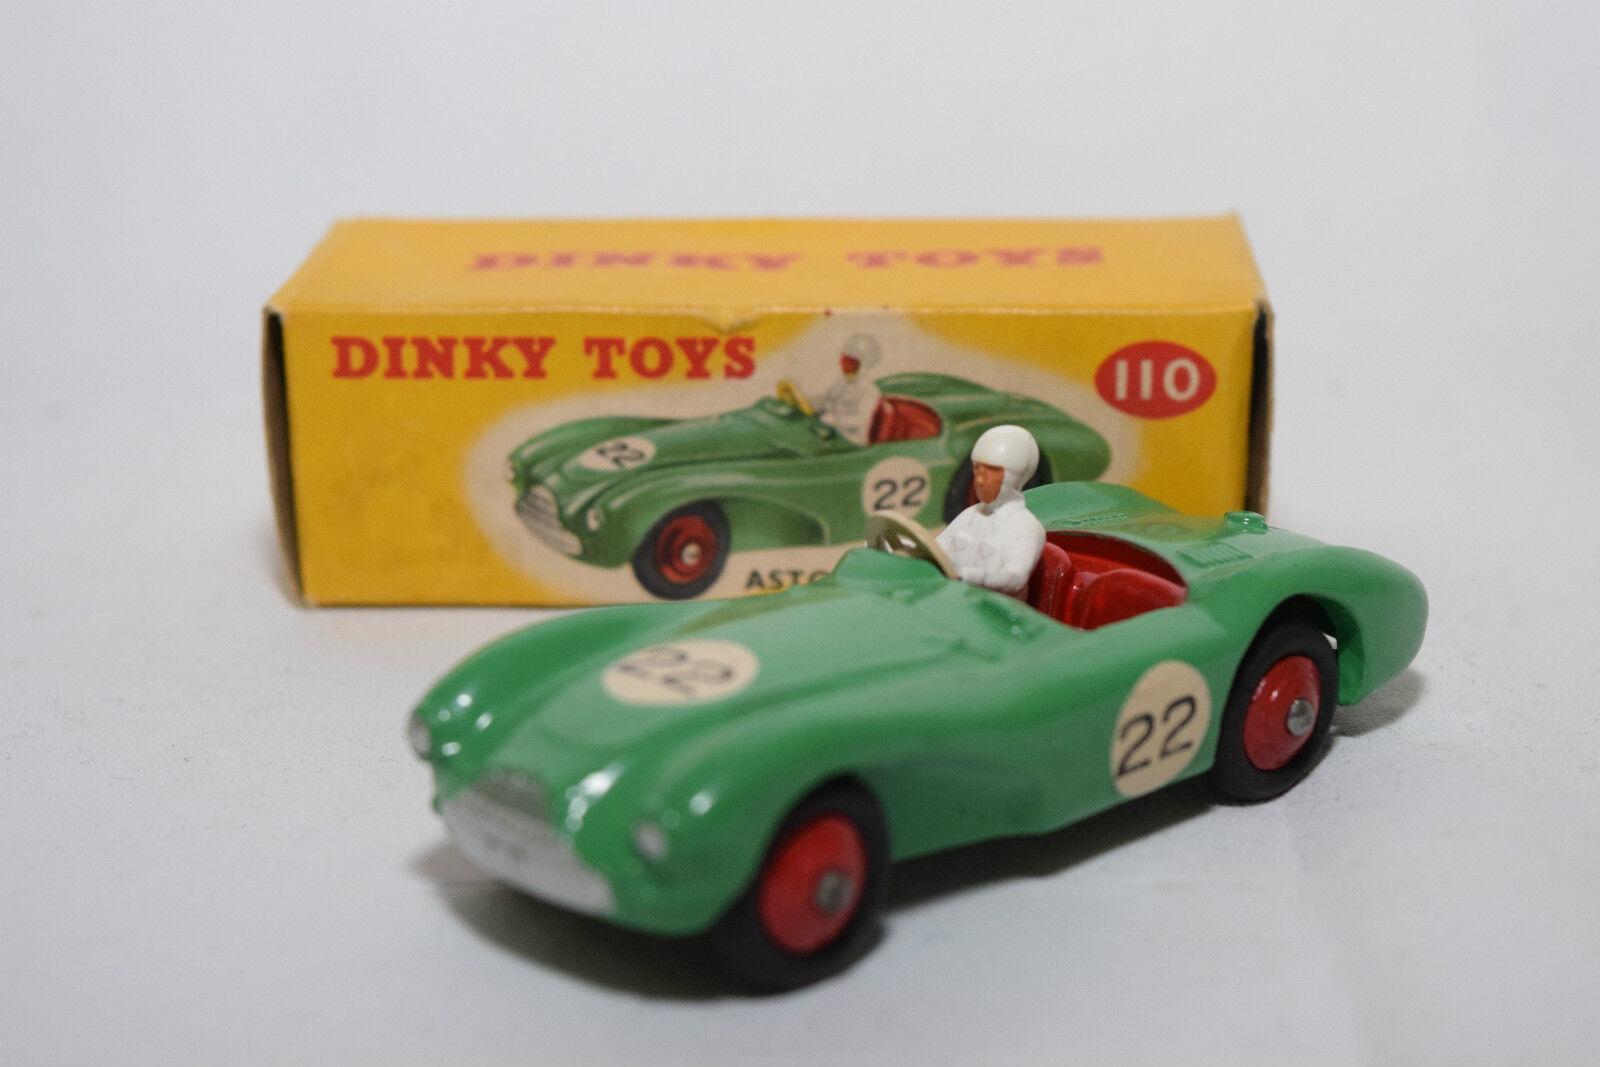 P Dinky Toys 110 aston martin db3 Sports vert Comme neuf EN BOÎTE RARE RARE